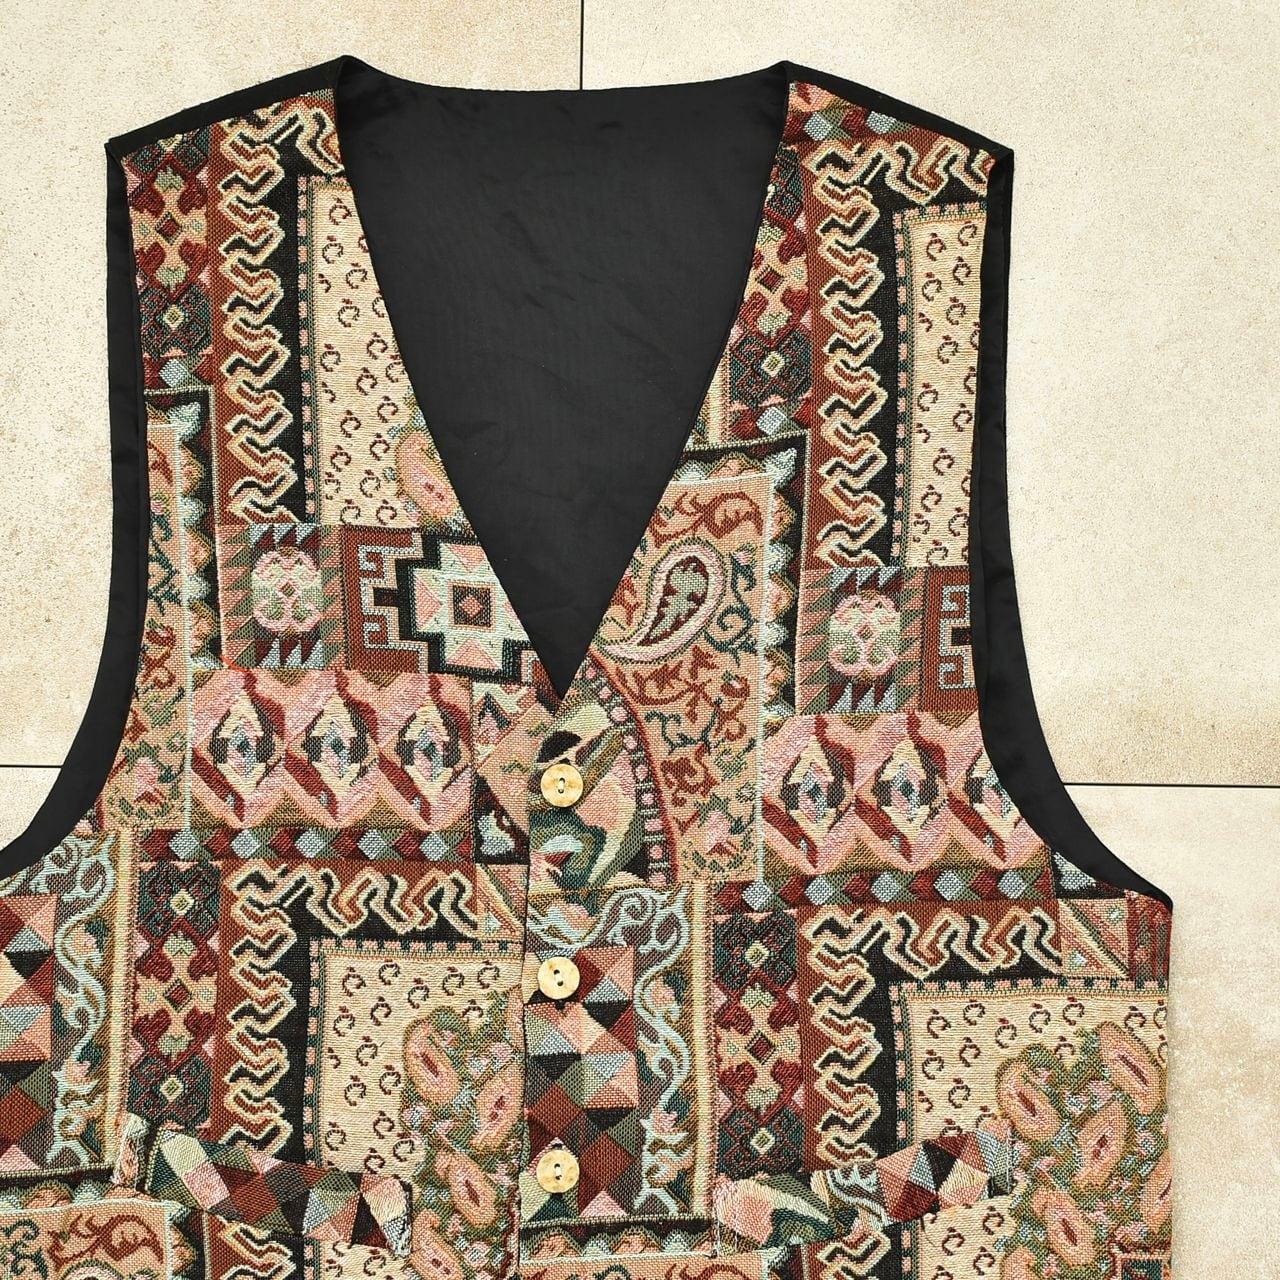 Antique pattern gobelin / tapestry vest